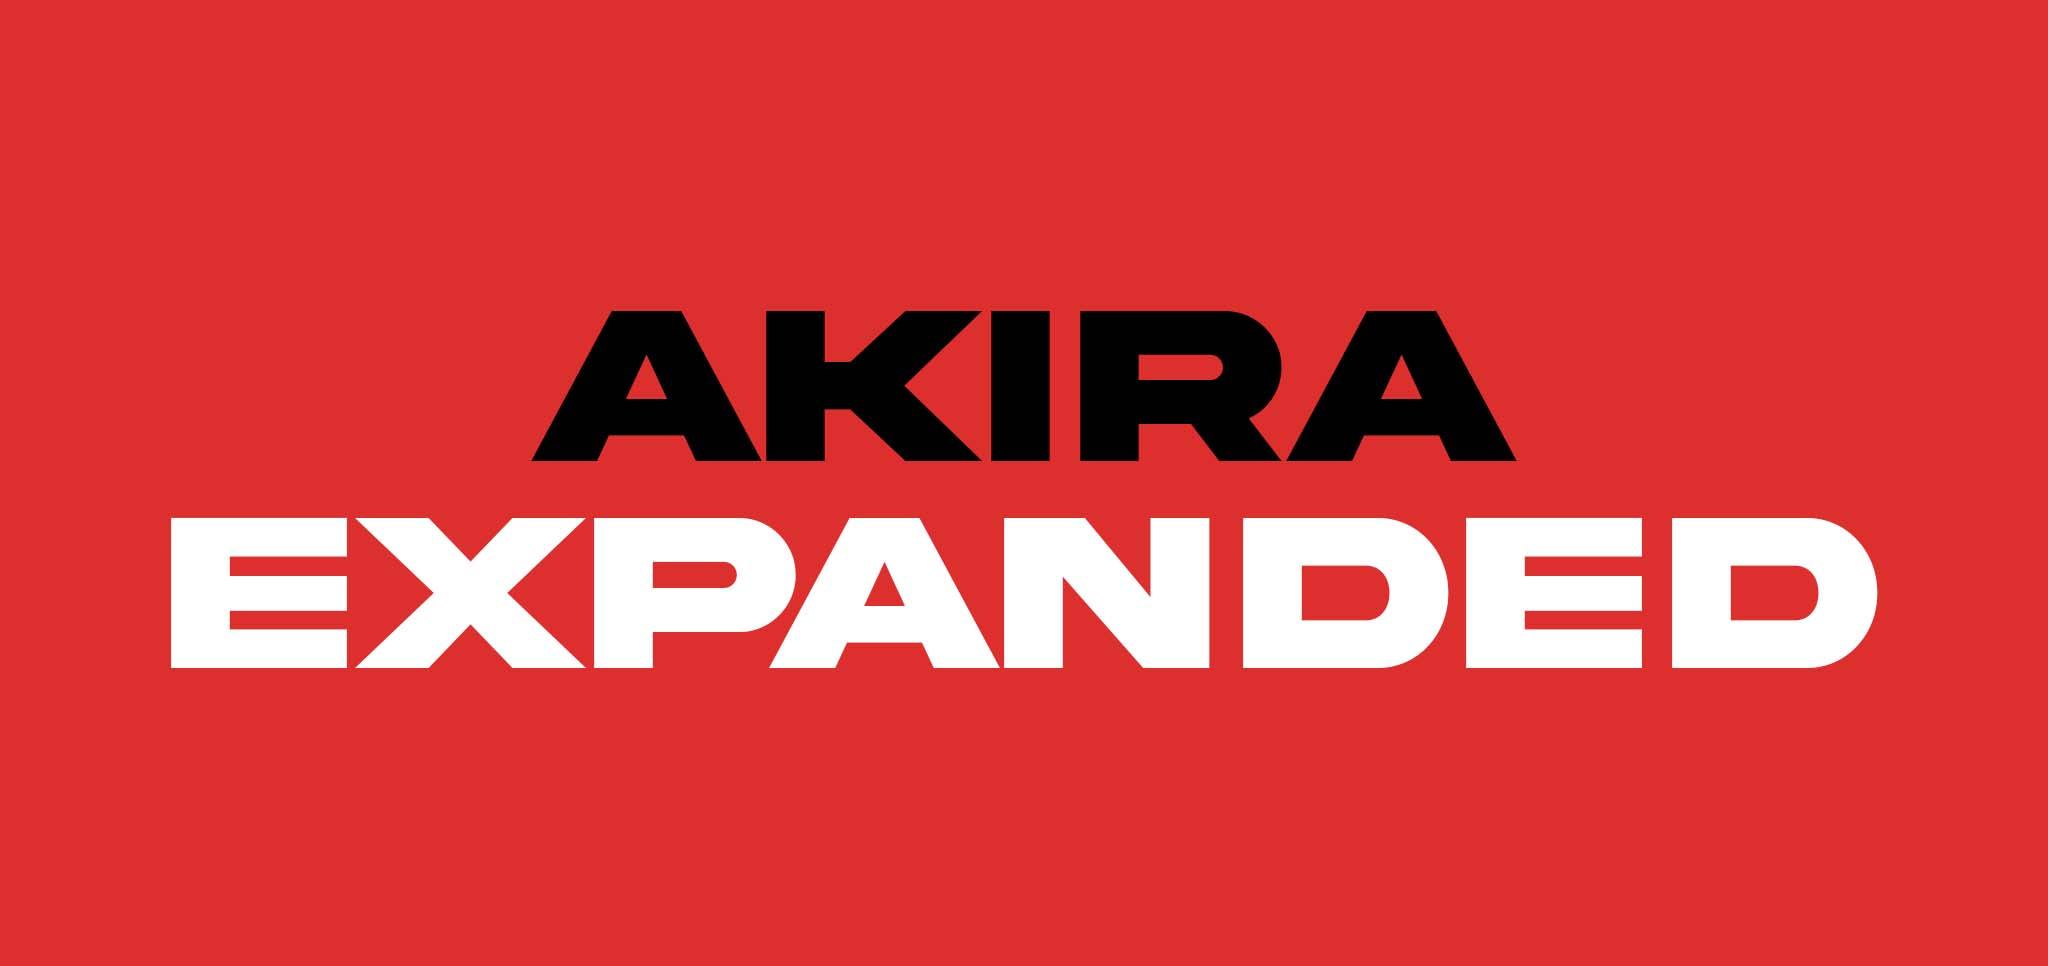 21 gratis stoere lettertypes - Akira Expanded